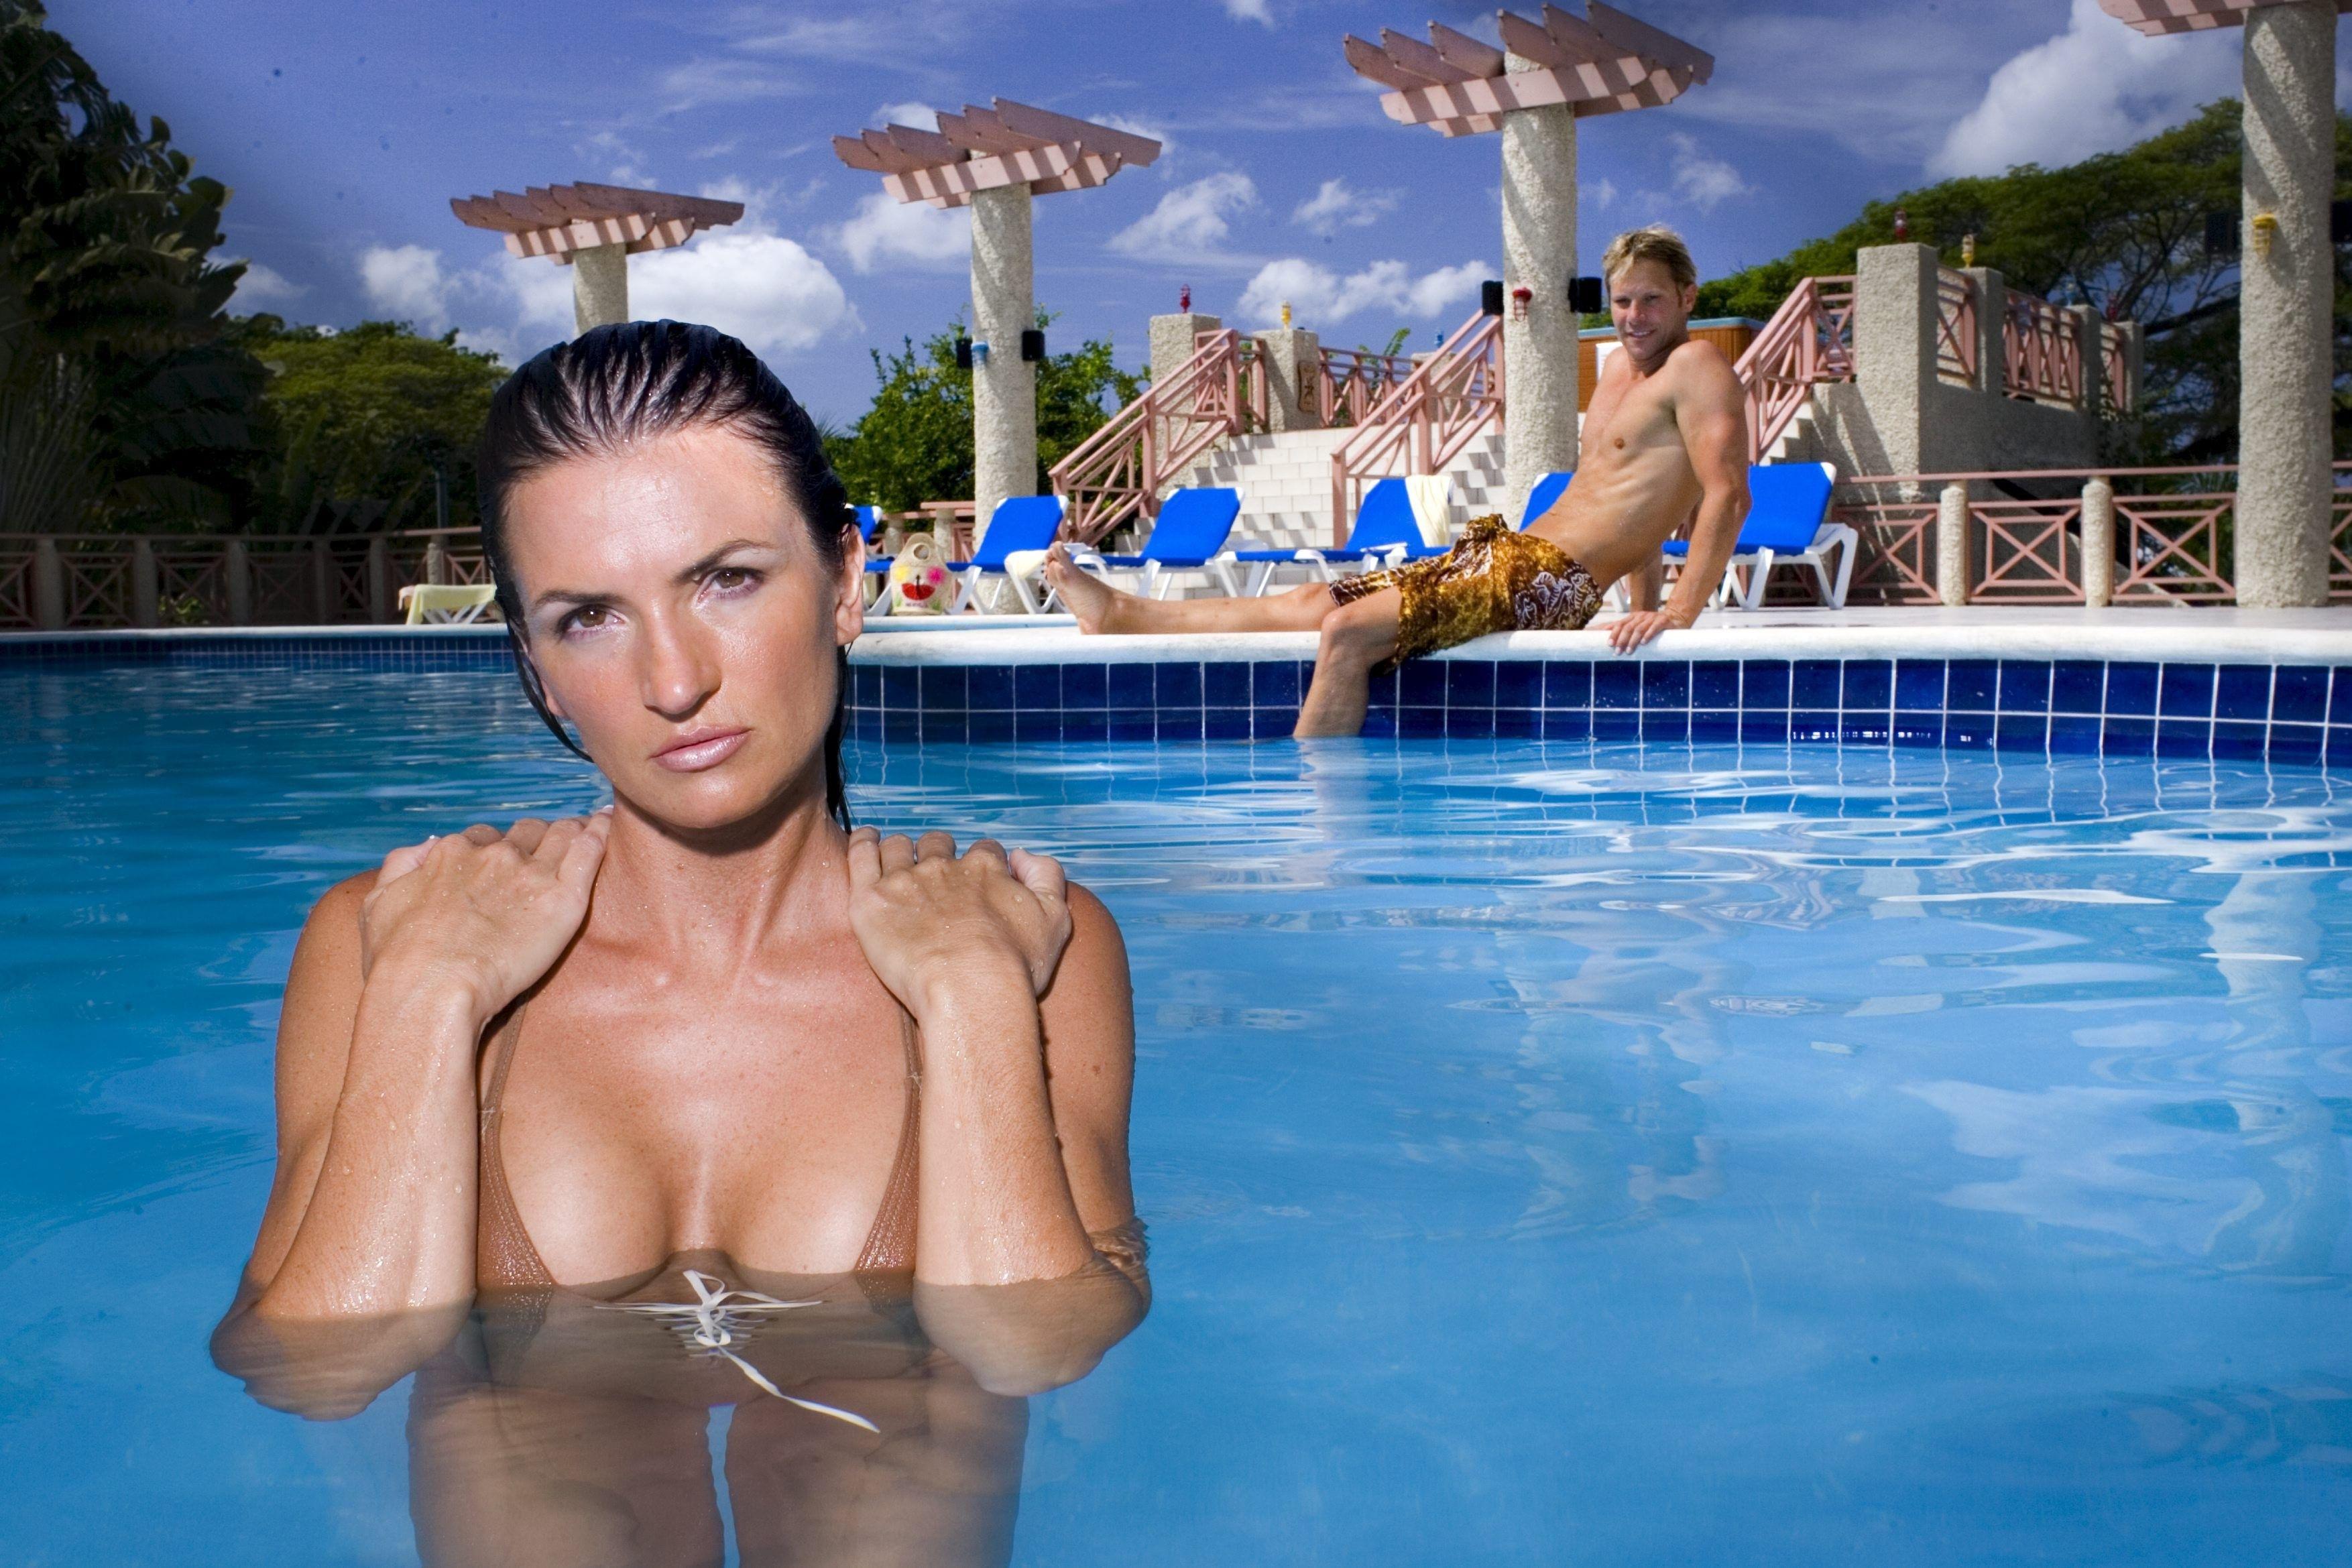 Hedonism Ii Xxx with regard to hedonism ii - a romantic vacation resort - best romantic vacations